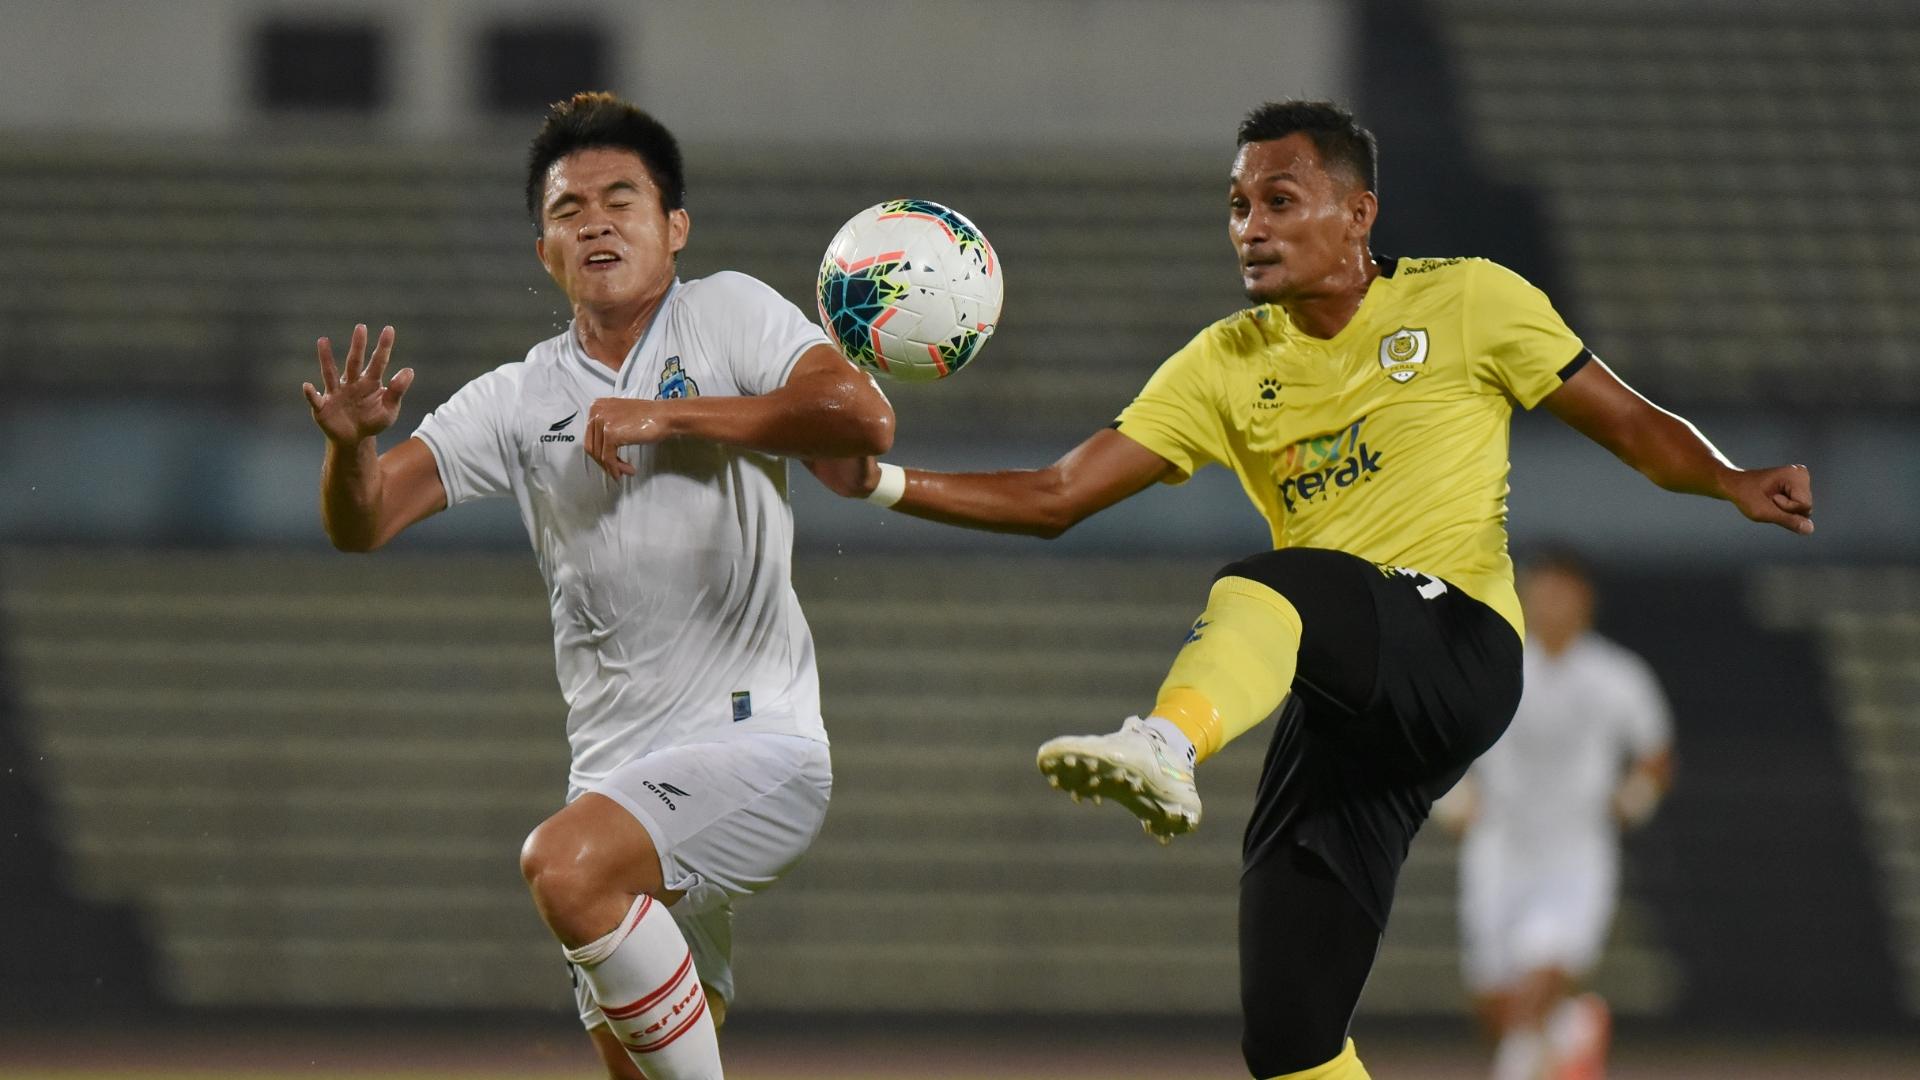 Rafiuddin Roddin, Sabah v Perak, Super League, 14 mar 2020